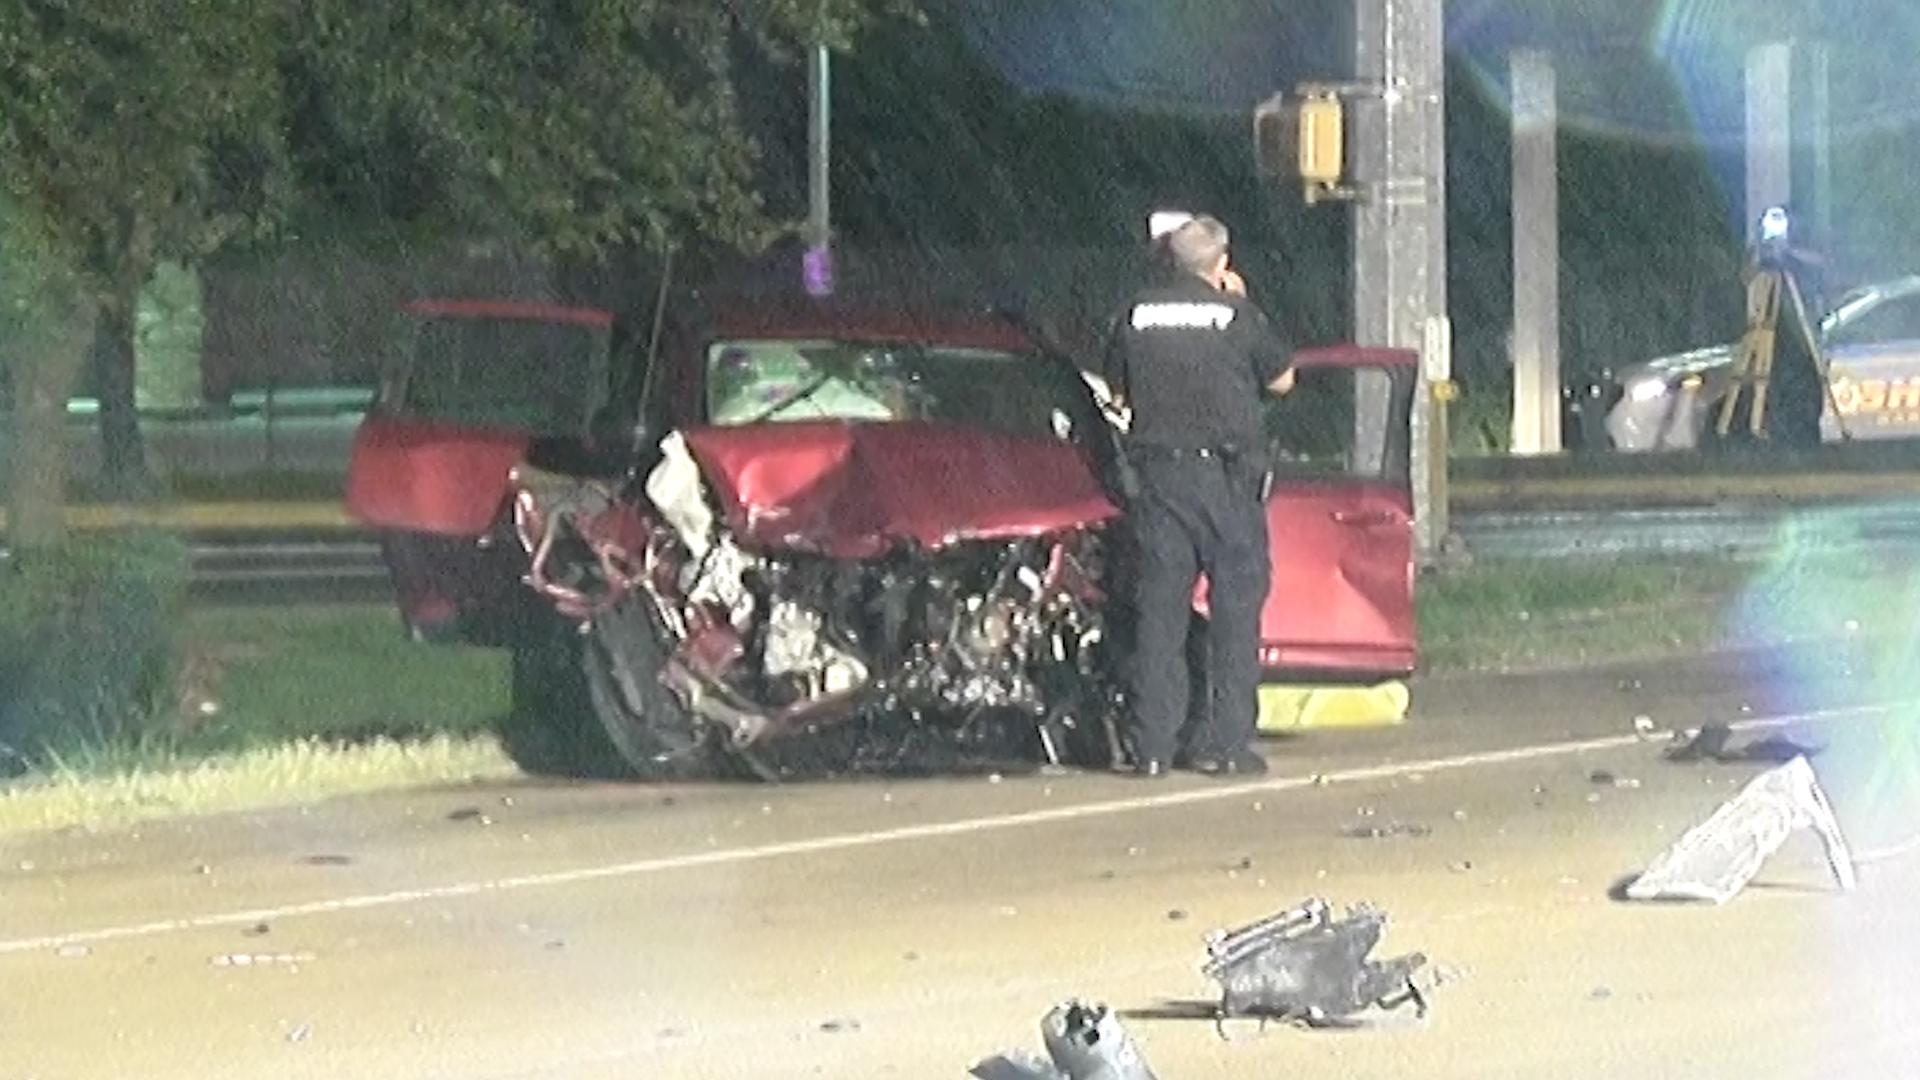 DRUNK DRIVER CAUSES FATAL CRASH